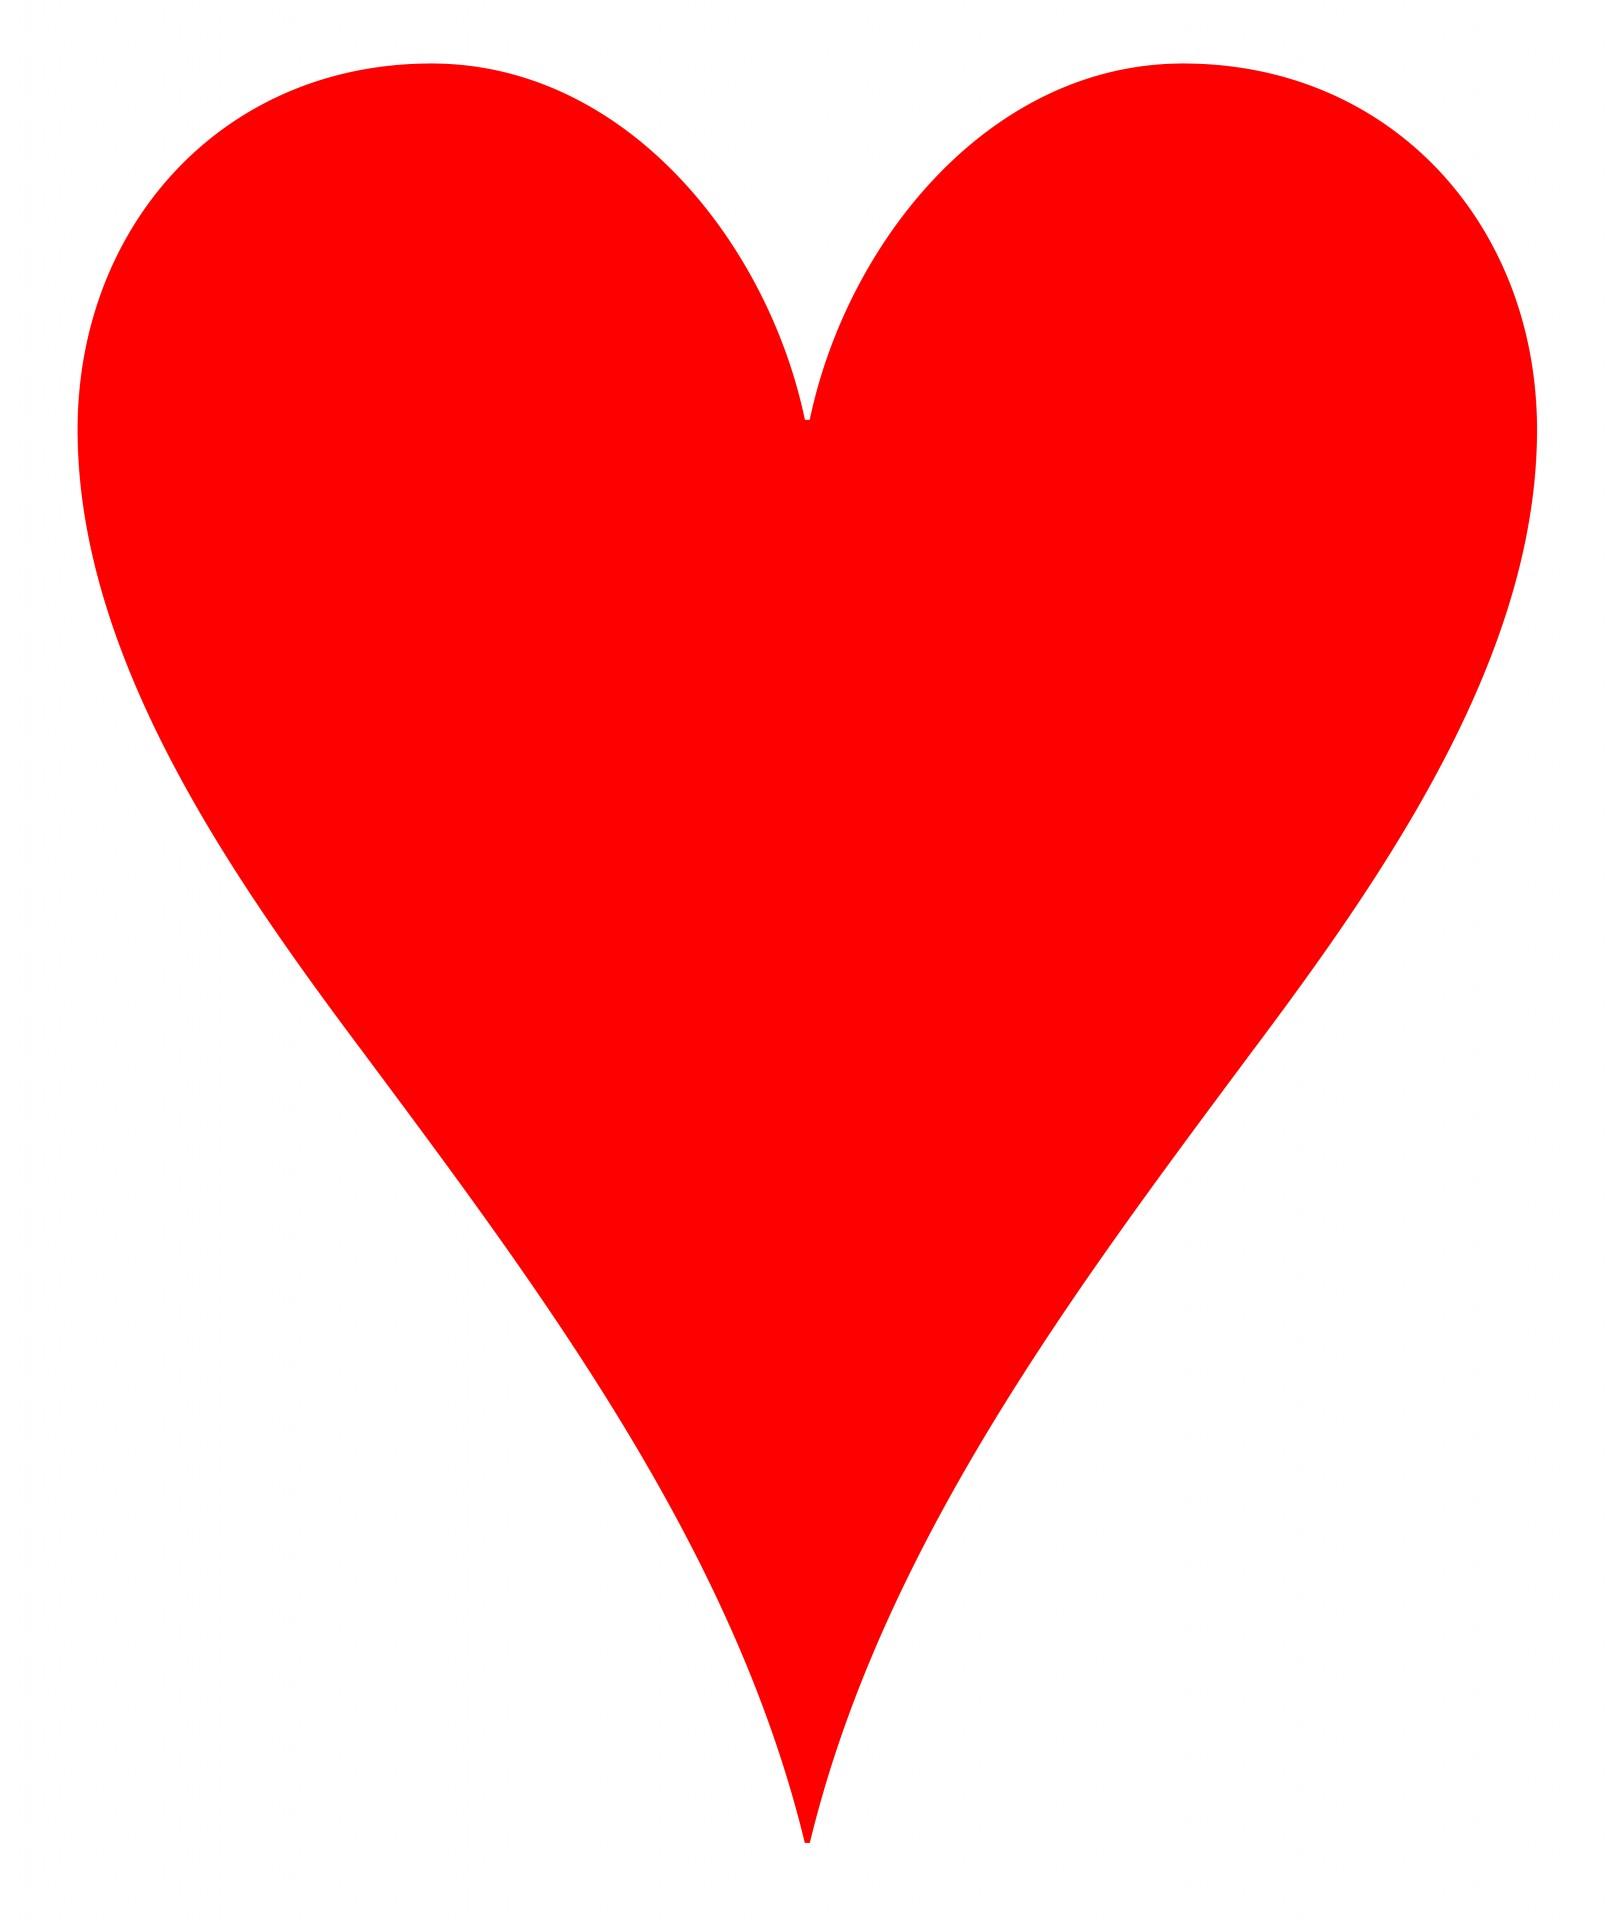 Red Heart Photos - ClipArt Best